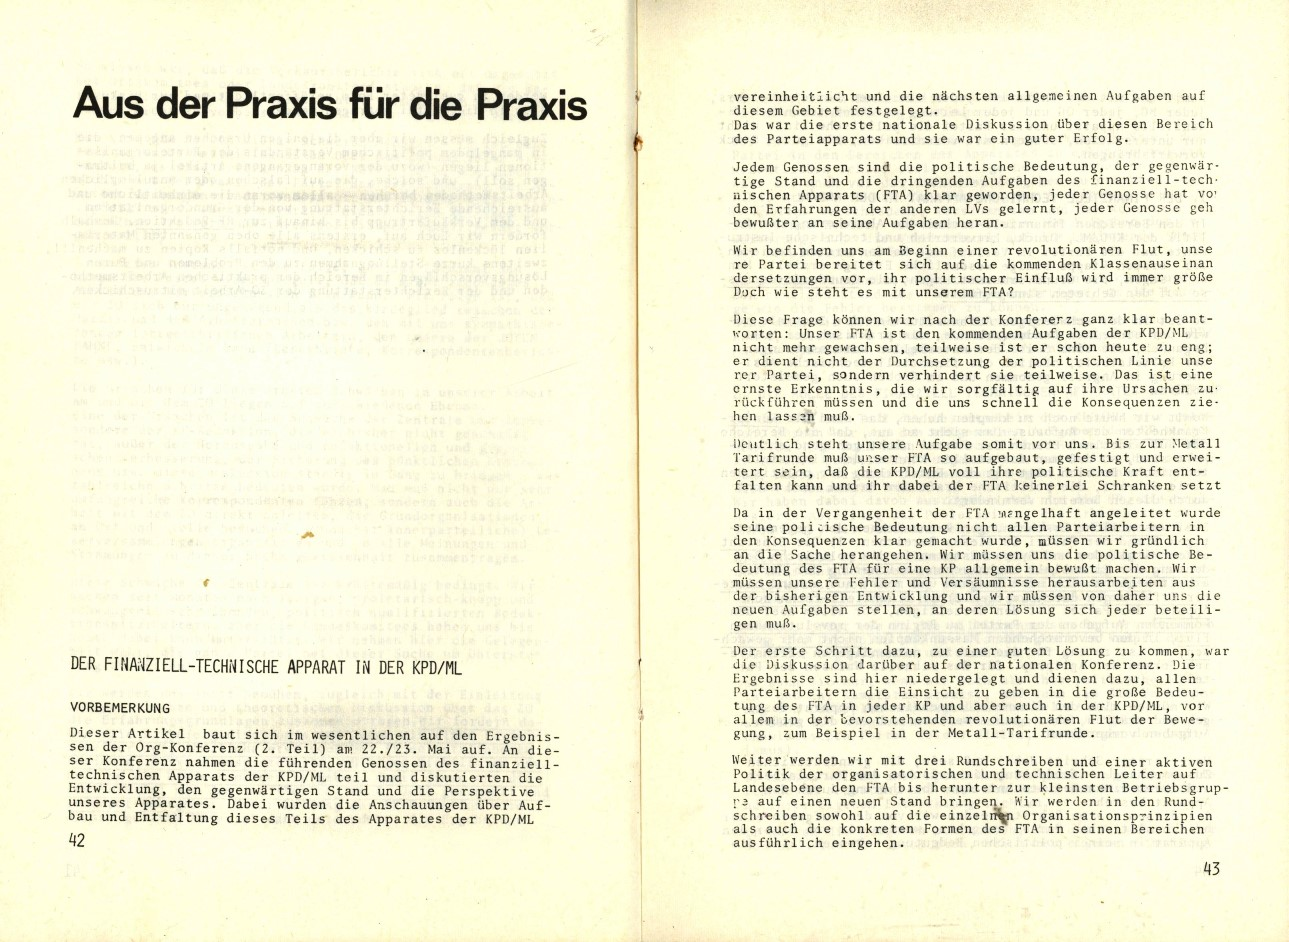 ZB_Parteiarbeiter_1971_06_23